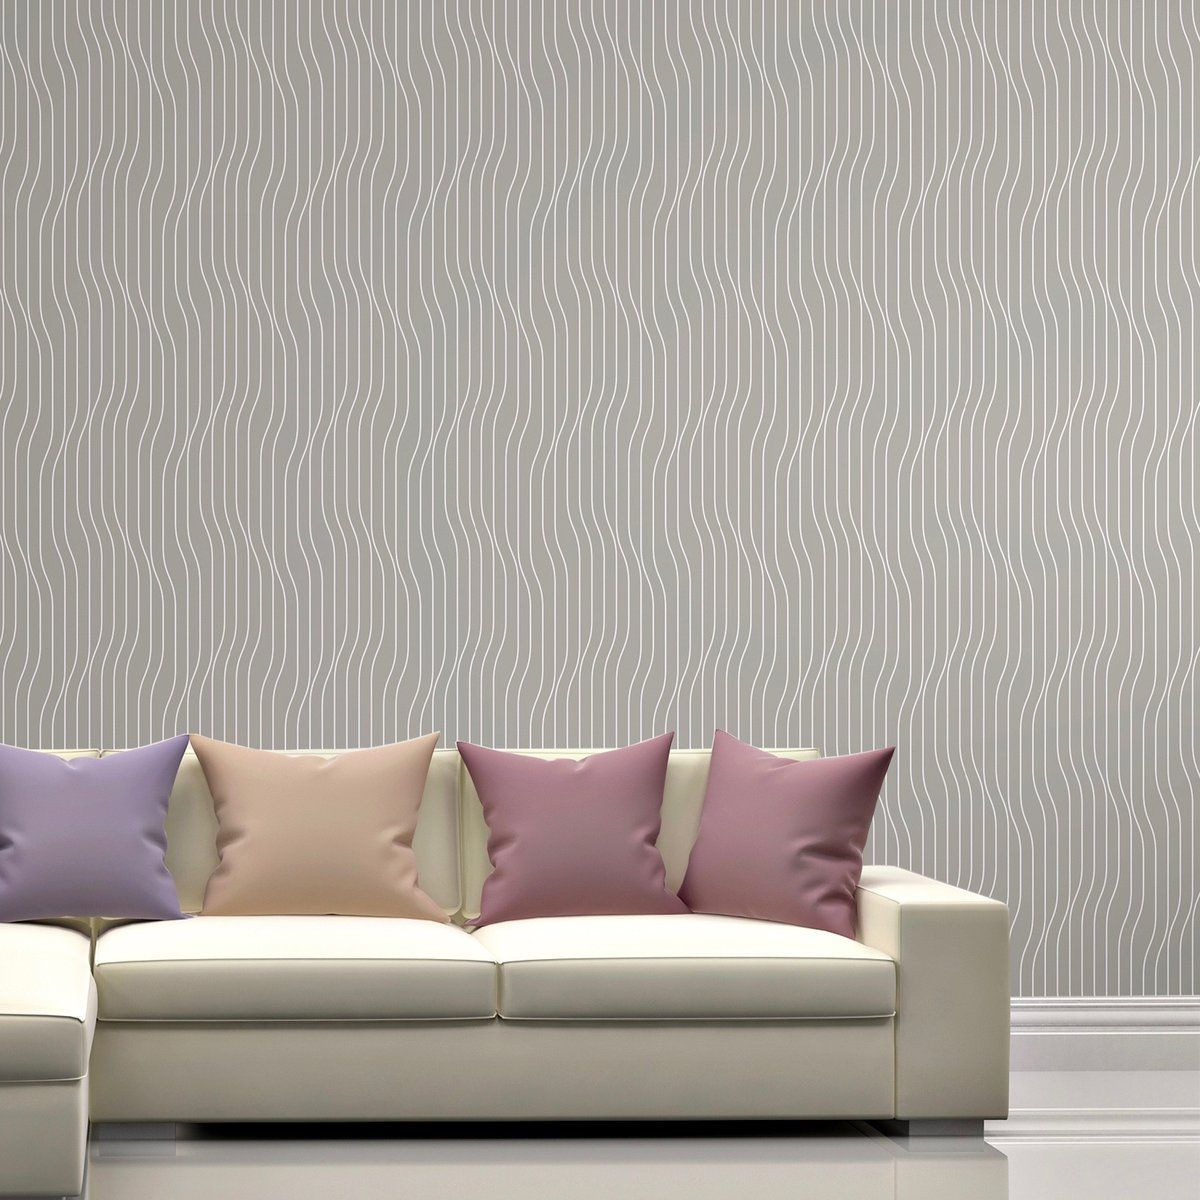 Veins Smooth Walls Peel And Stick Wallpaper Home Wallpaper